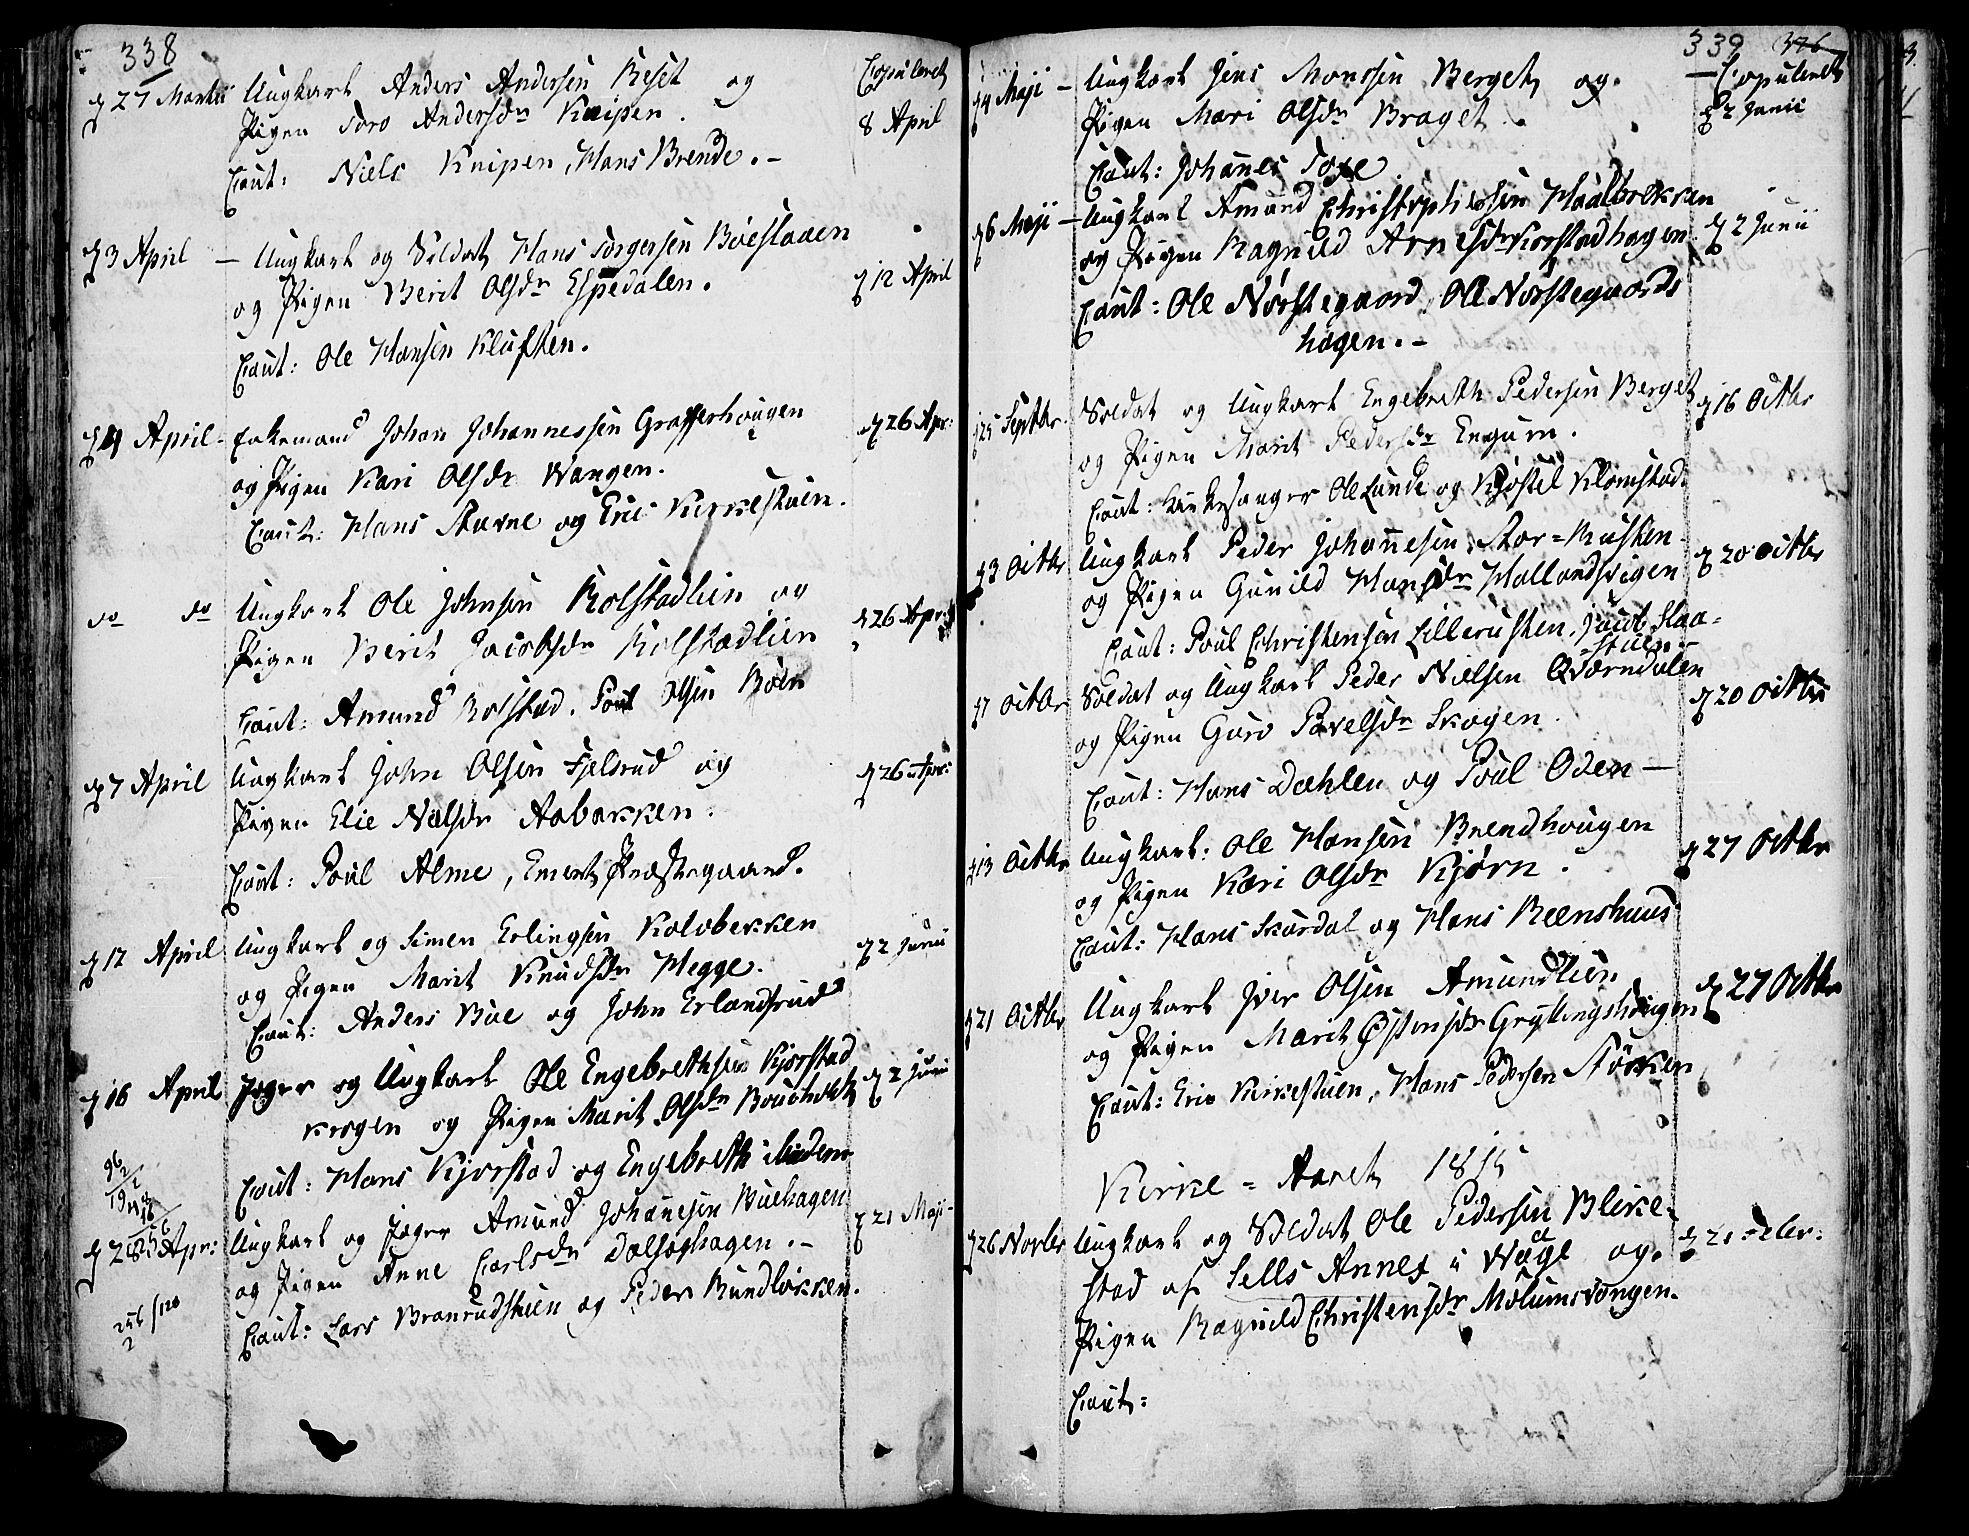 SAH, Fron prestekontor, H/Ha/Haa/L0001: Ministerialbok nr. 1, 1799-1816, s. 338-339